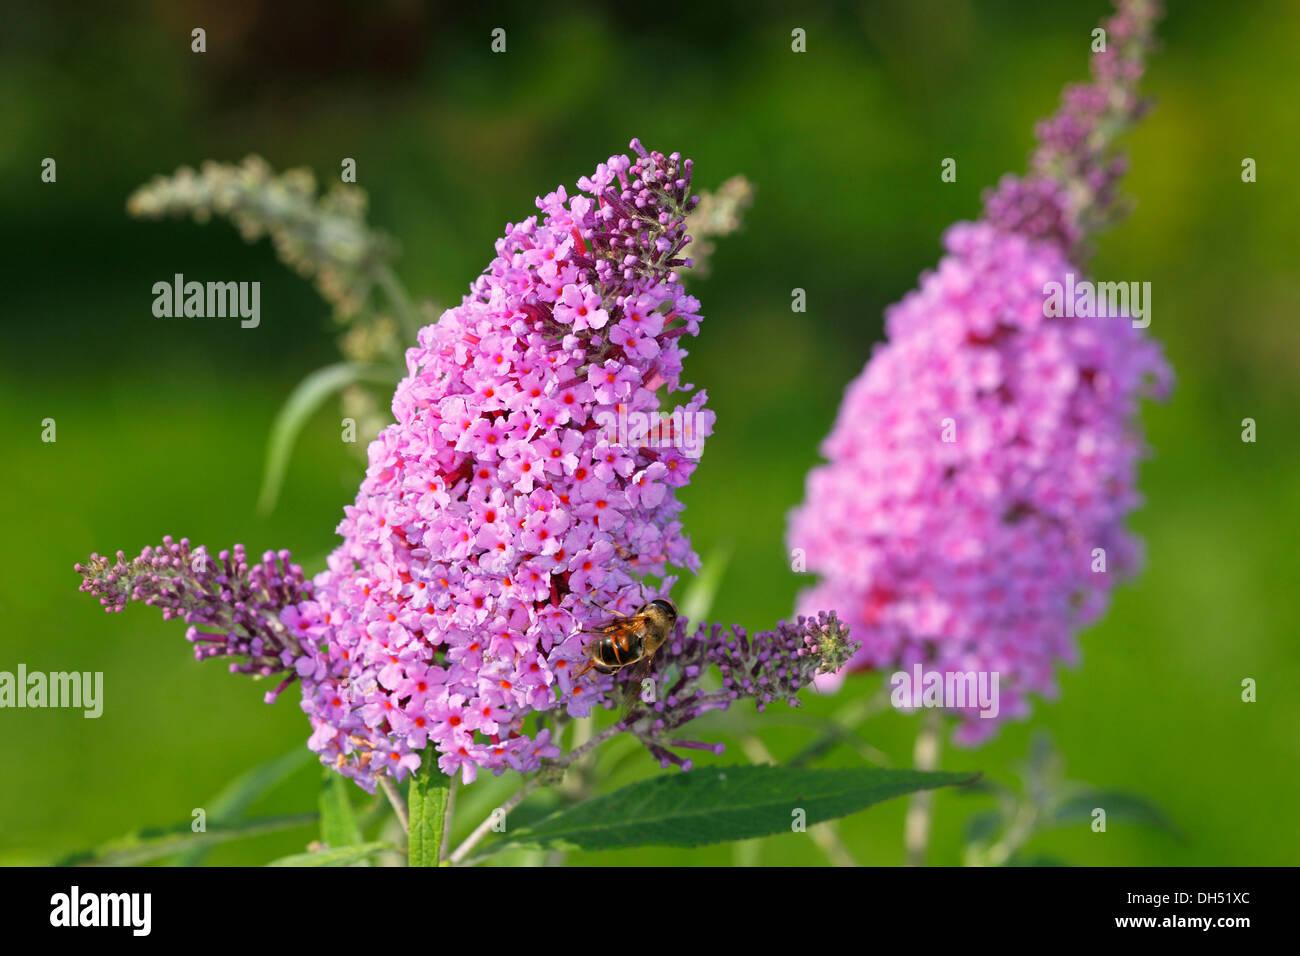 Purple flowering Buddleja, Buddleia, Summer Lilac or Butterfly-Bush (Buddleja 'Buzz Blue') - Stock Image